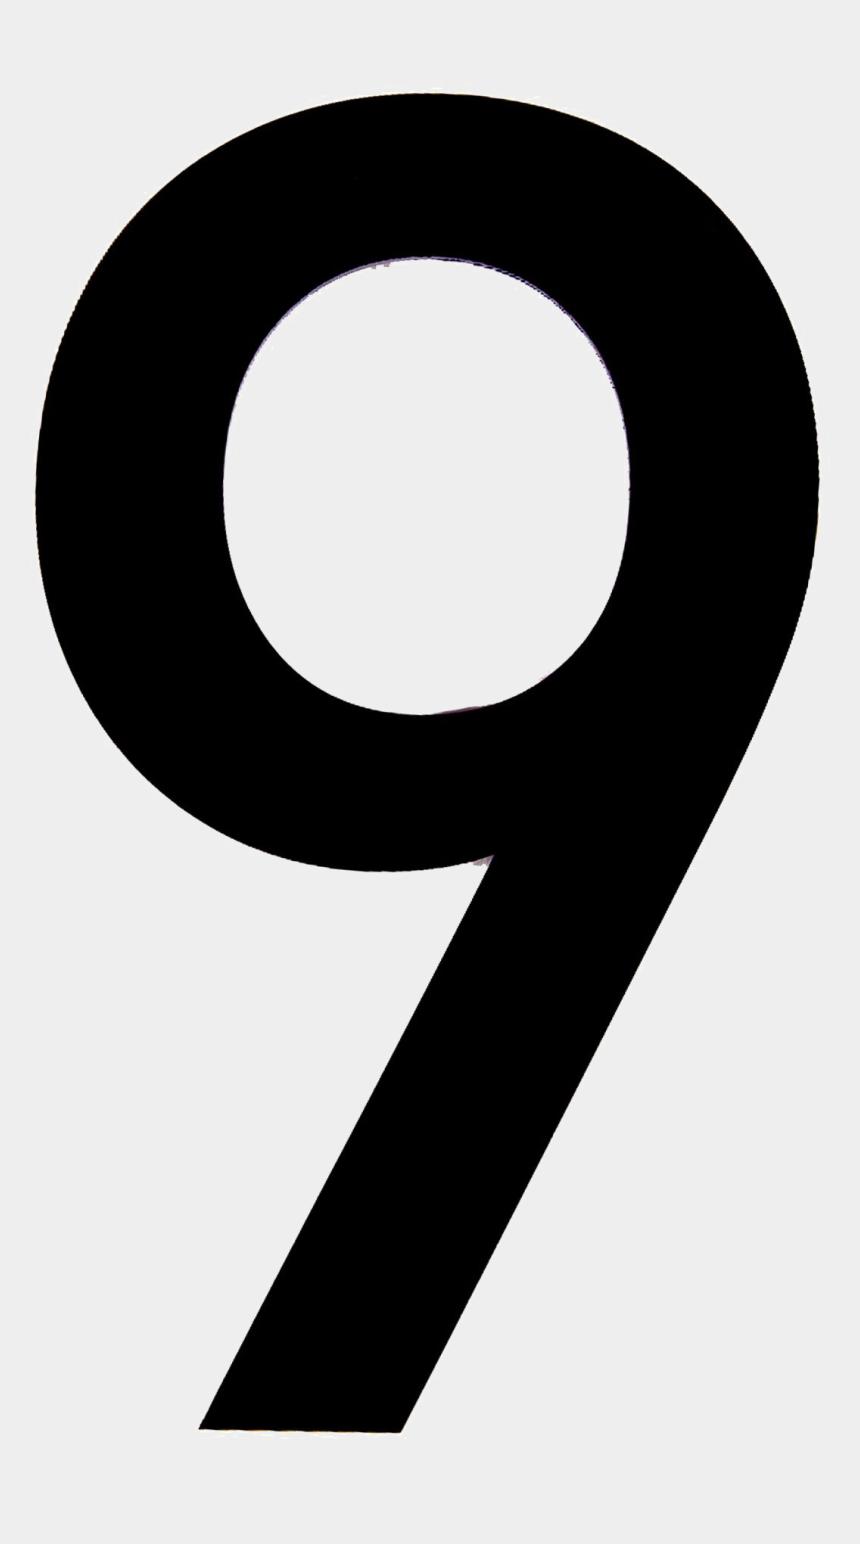 number nine clipart, Cartoons - 9 Number Png Transparent Image - Number 9 Black And White Clip Art